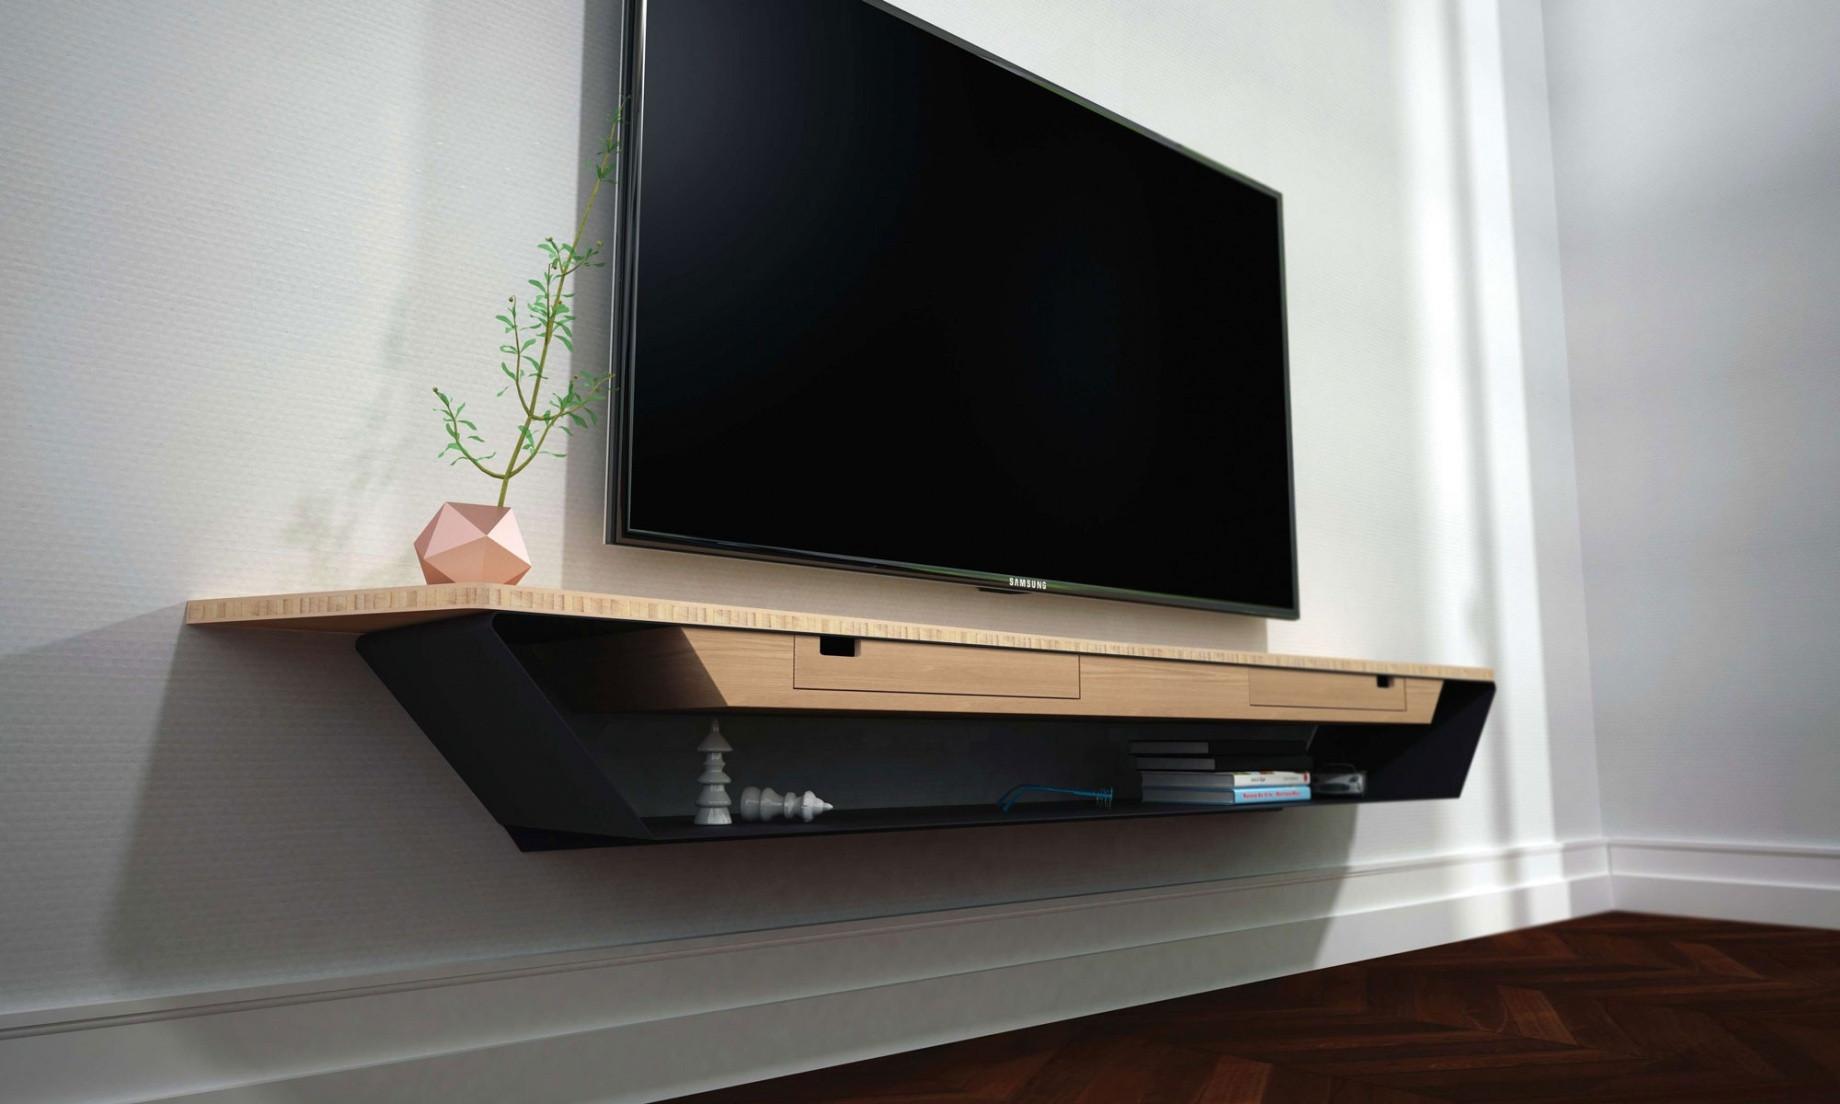 meuble tv suspendu led meuble de tele meuble tv suspendu etagere suspendu 0d of meuble tv suspendu led